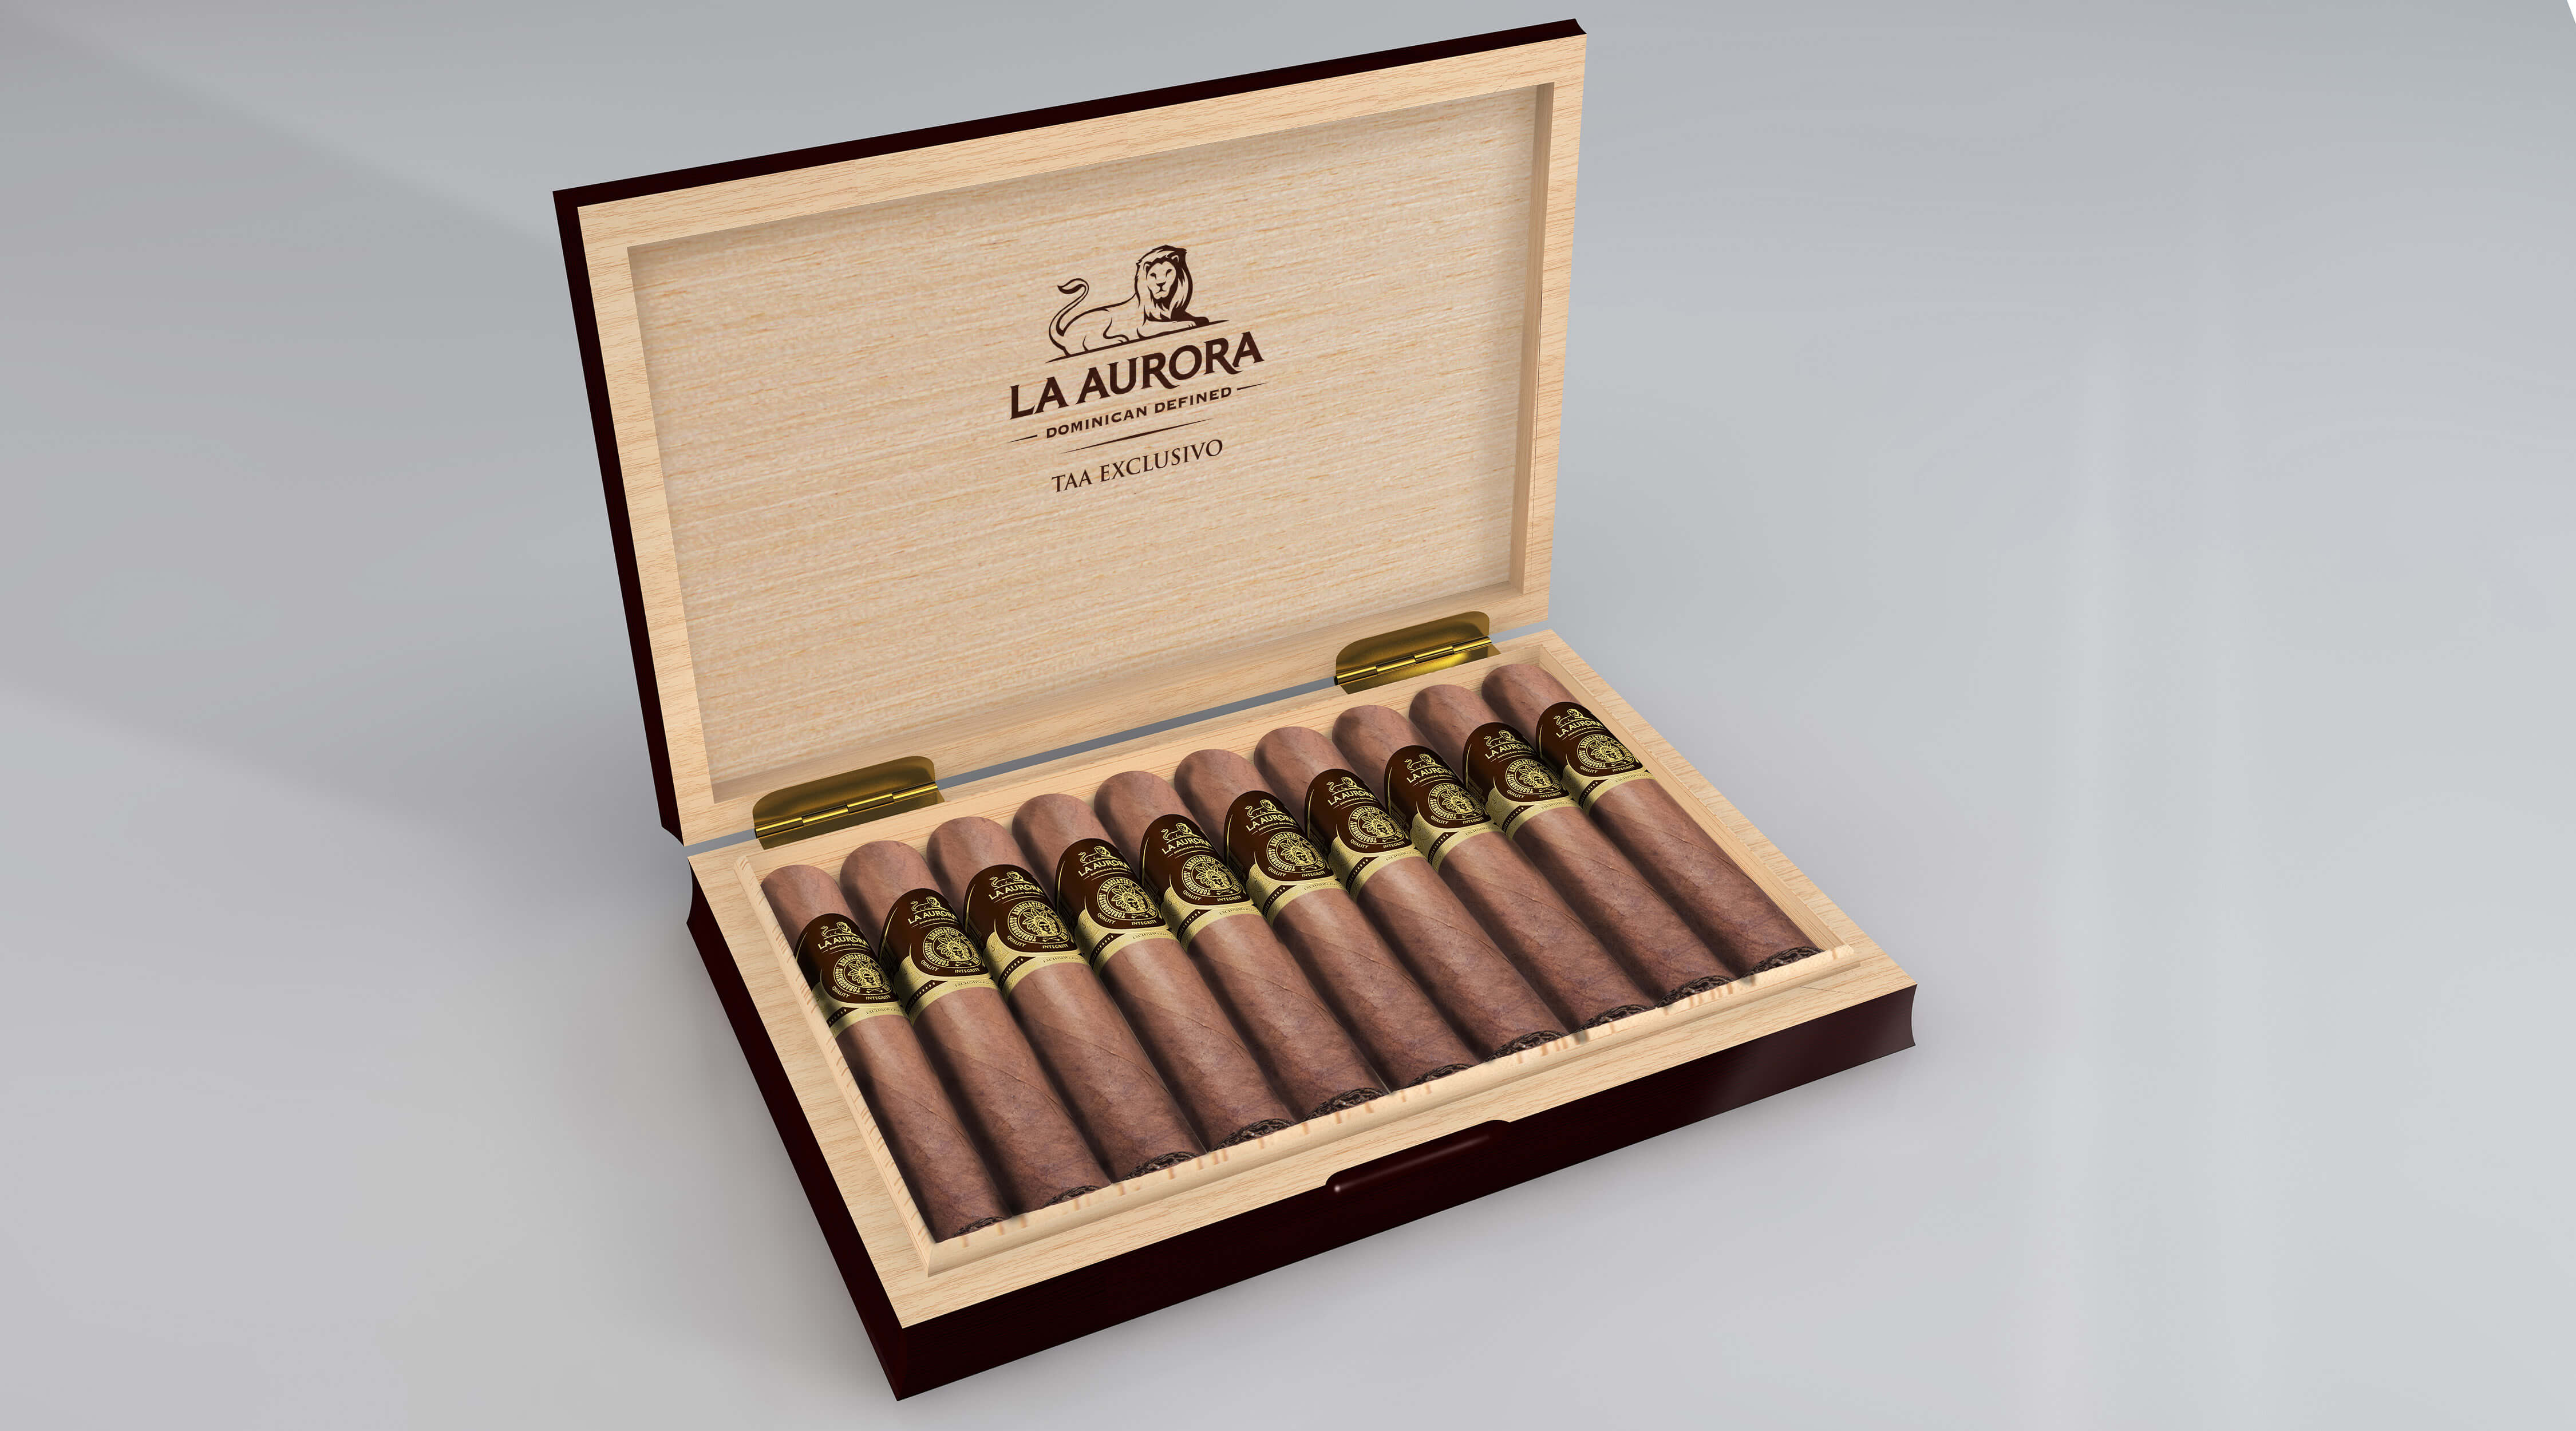 Cigar News: Miami Cigar & Co. Announces La Aurora TAA Exclusivo